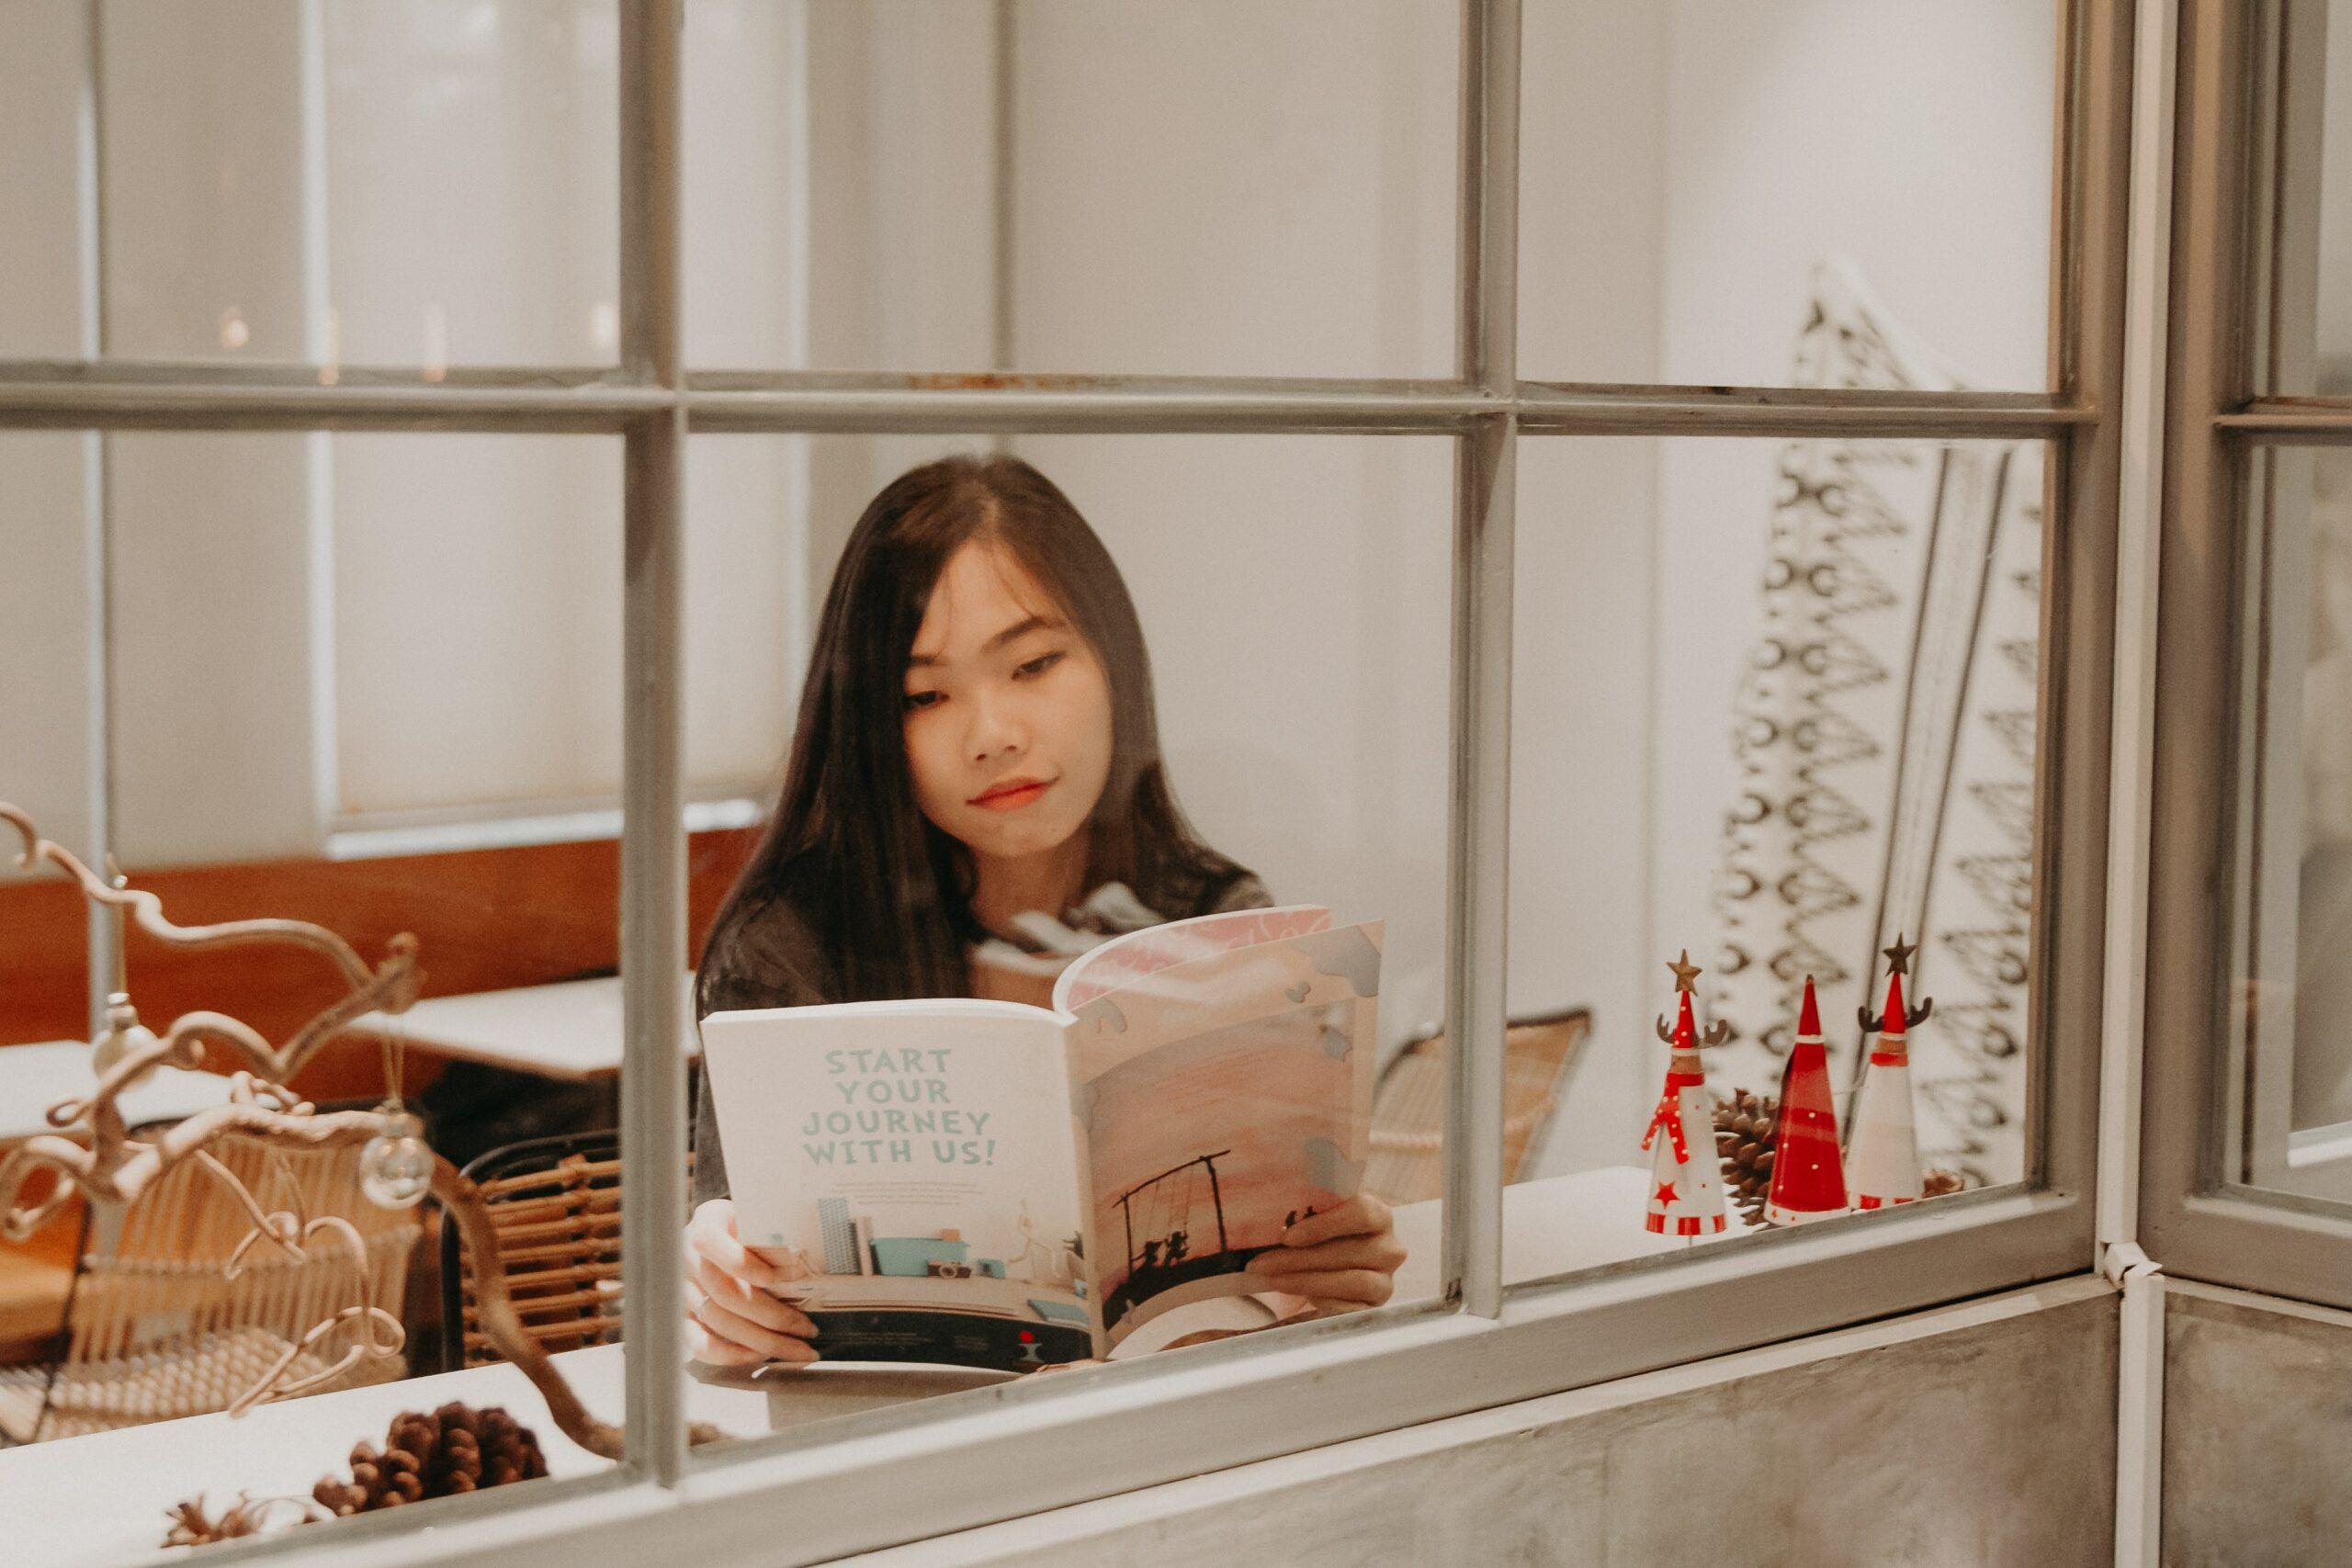 Asian woman reading a book near window